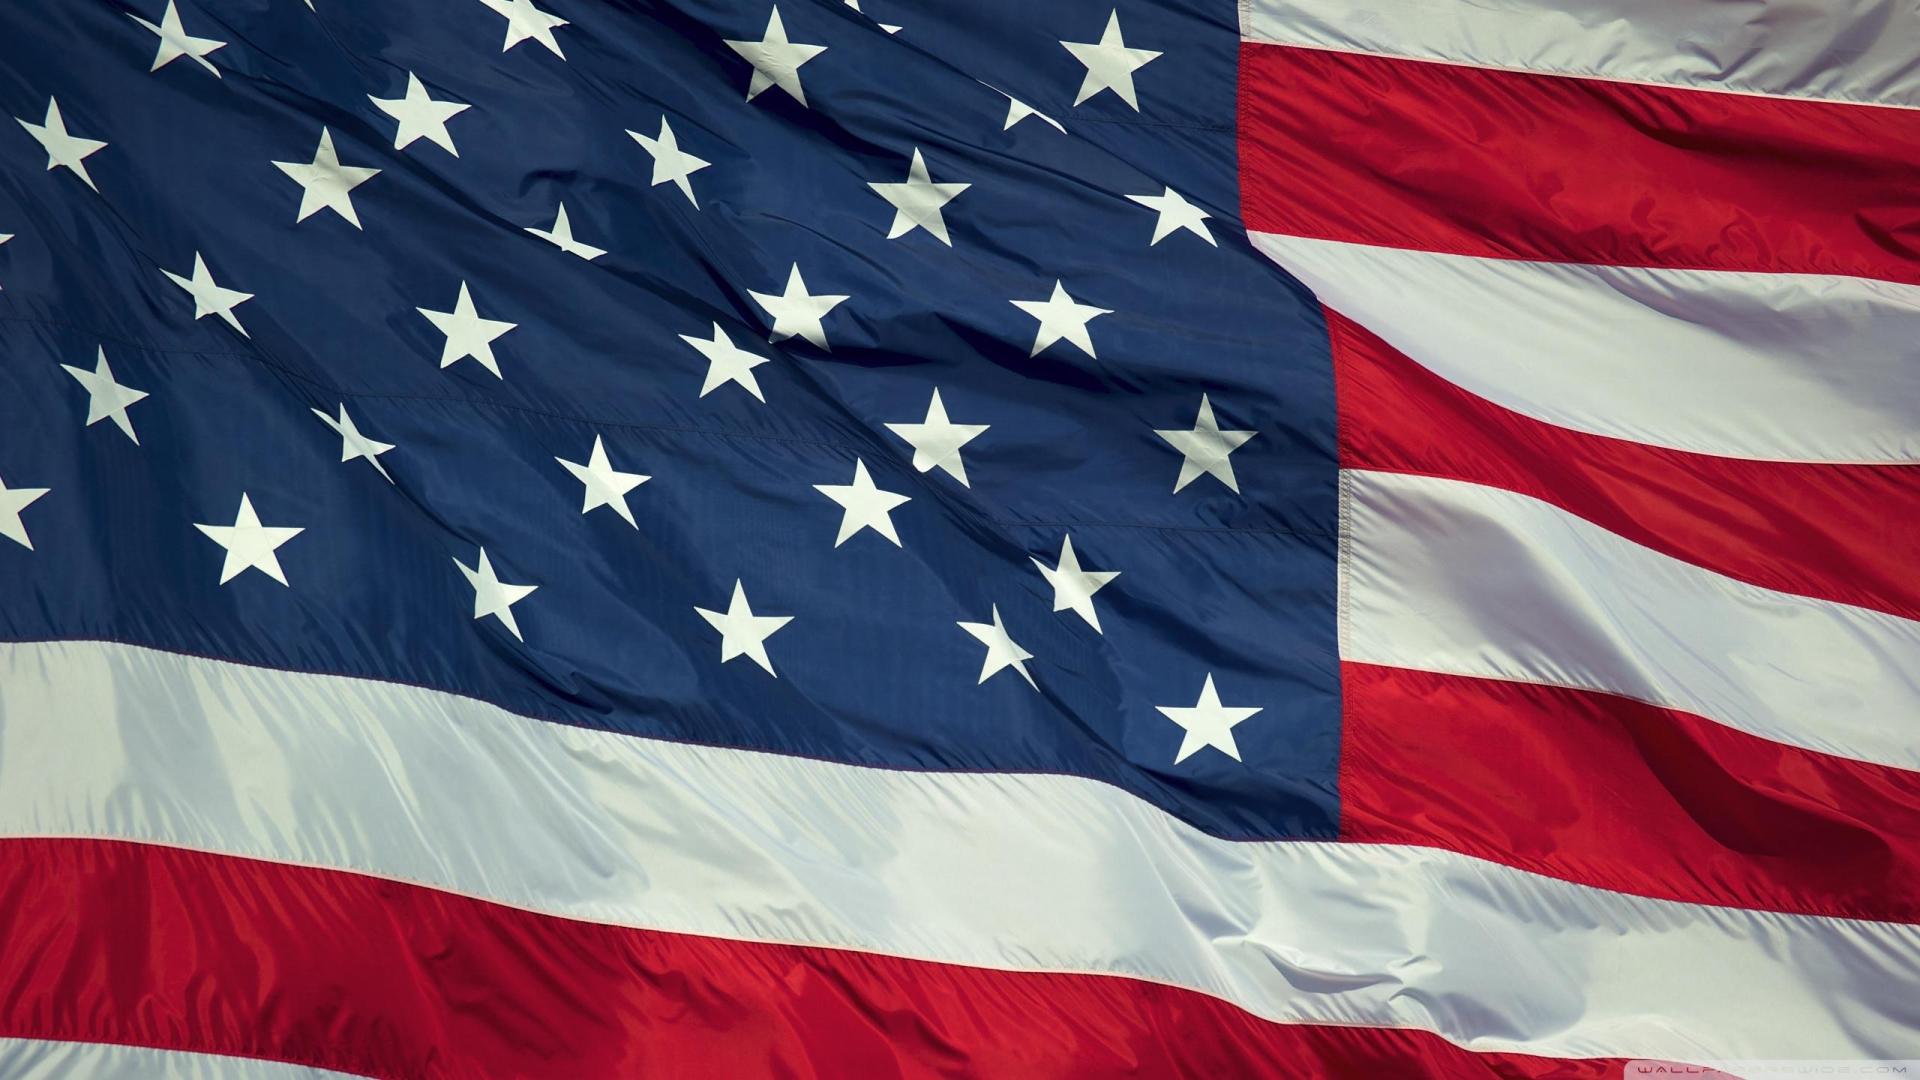 AmericanUSA Flag HD Desktop Mobile Wallpaper Background   9walls 1920x1080